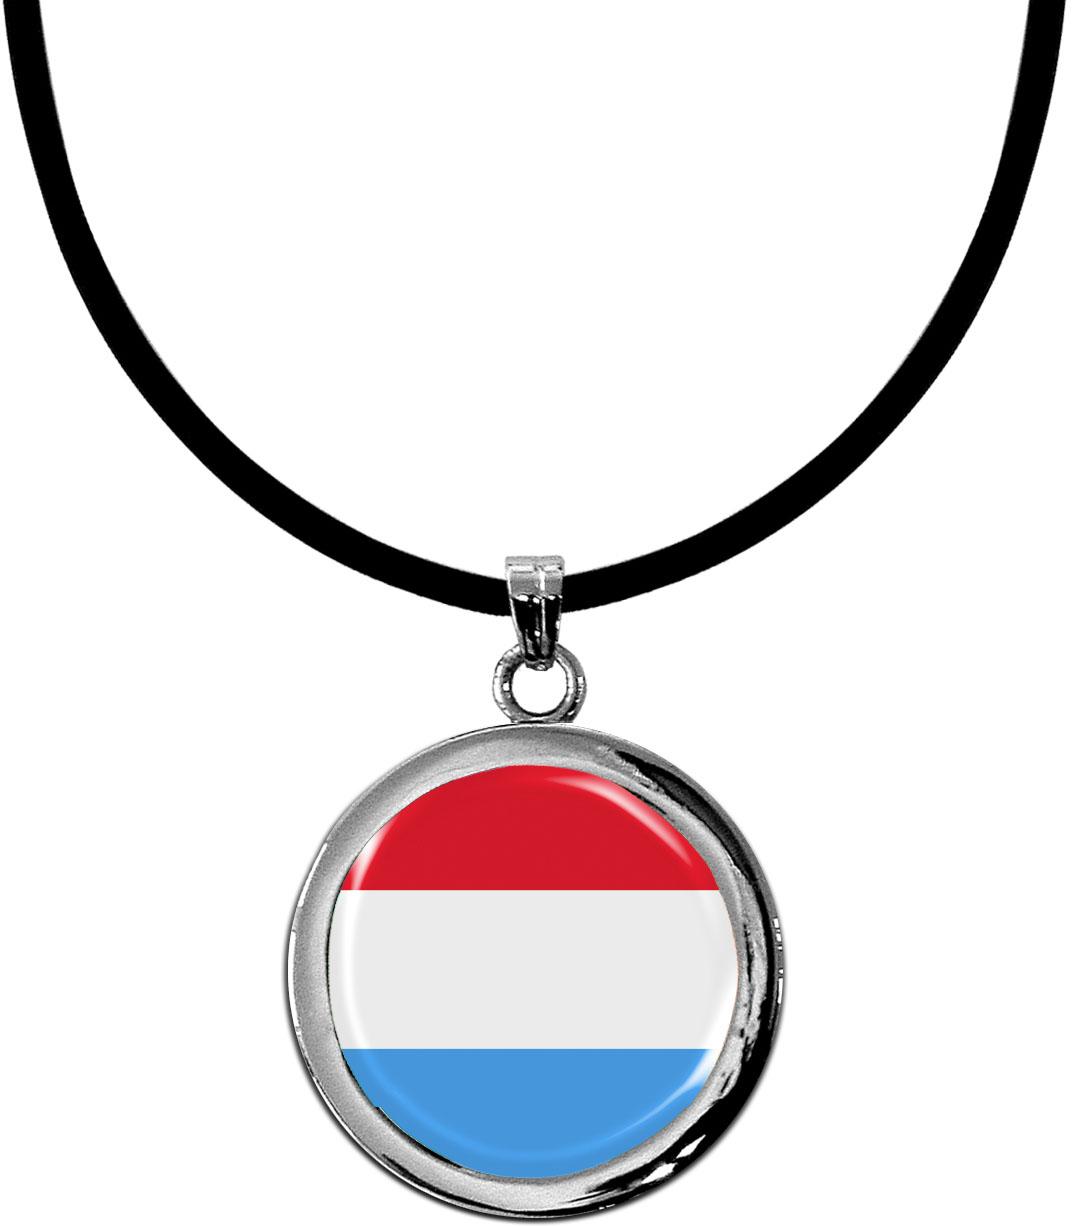 Kettenanhänger / Luxemburg / Silikonband mit Silberverschluss